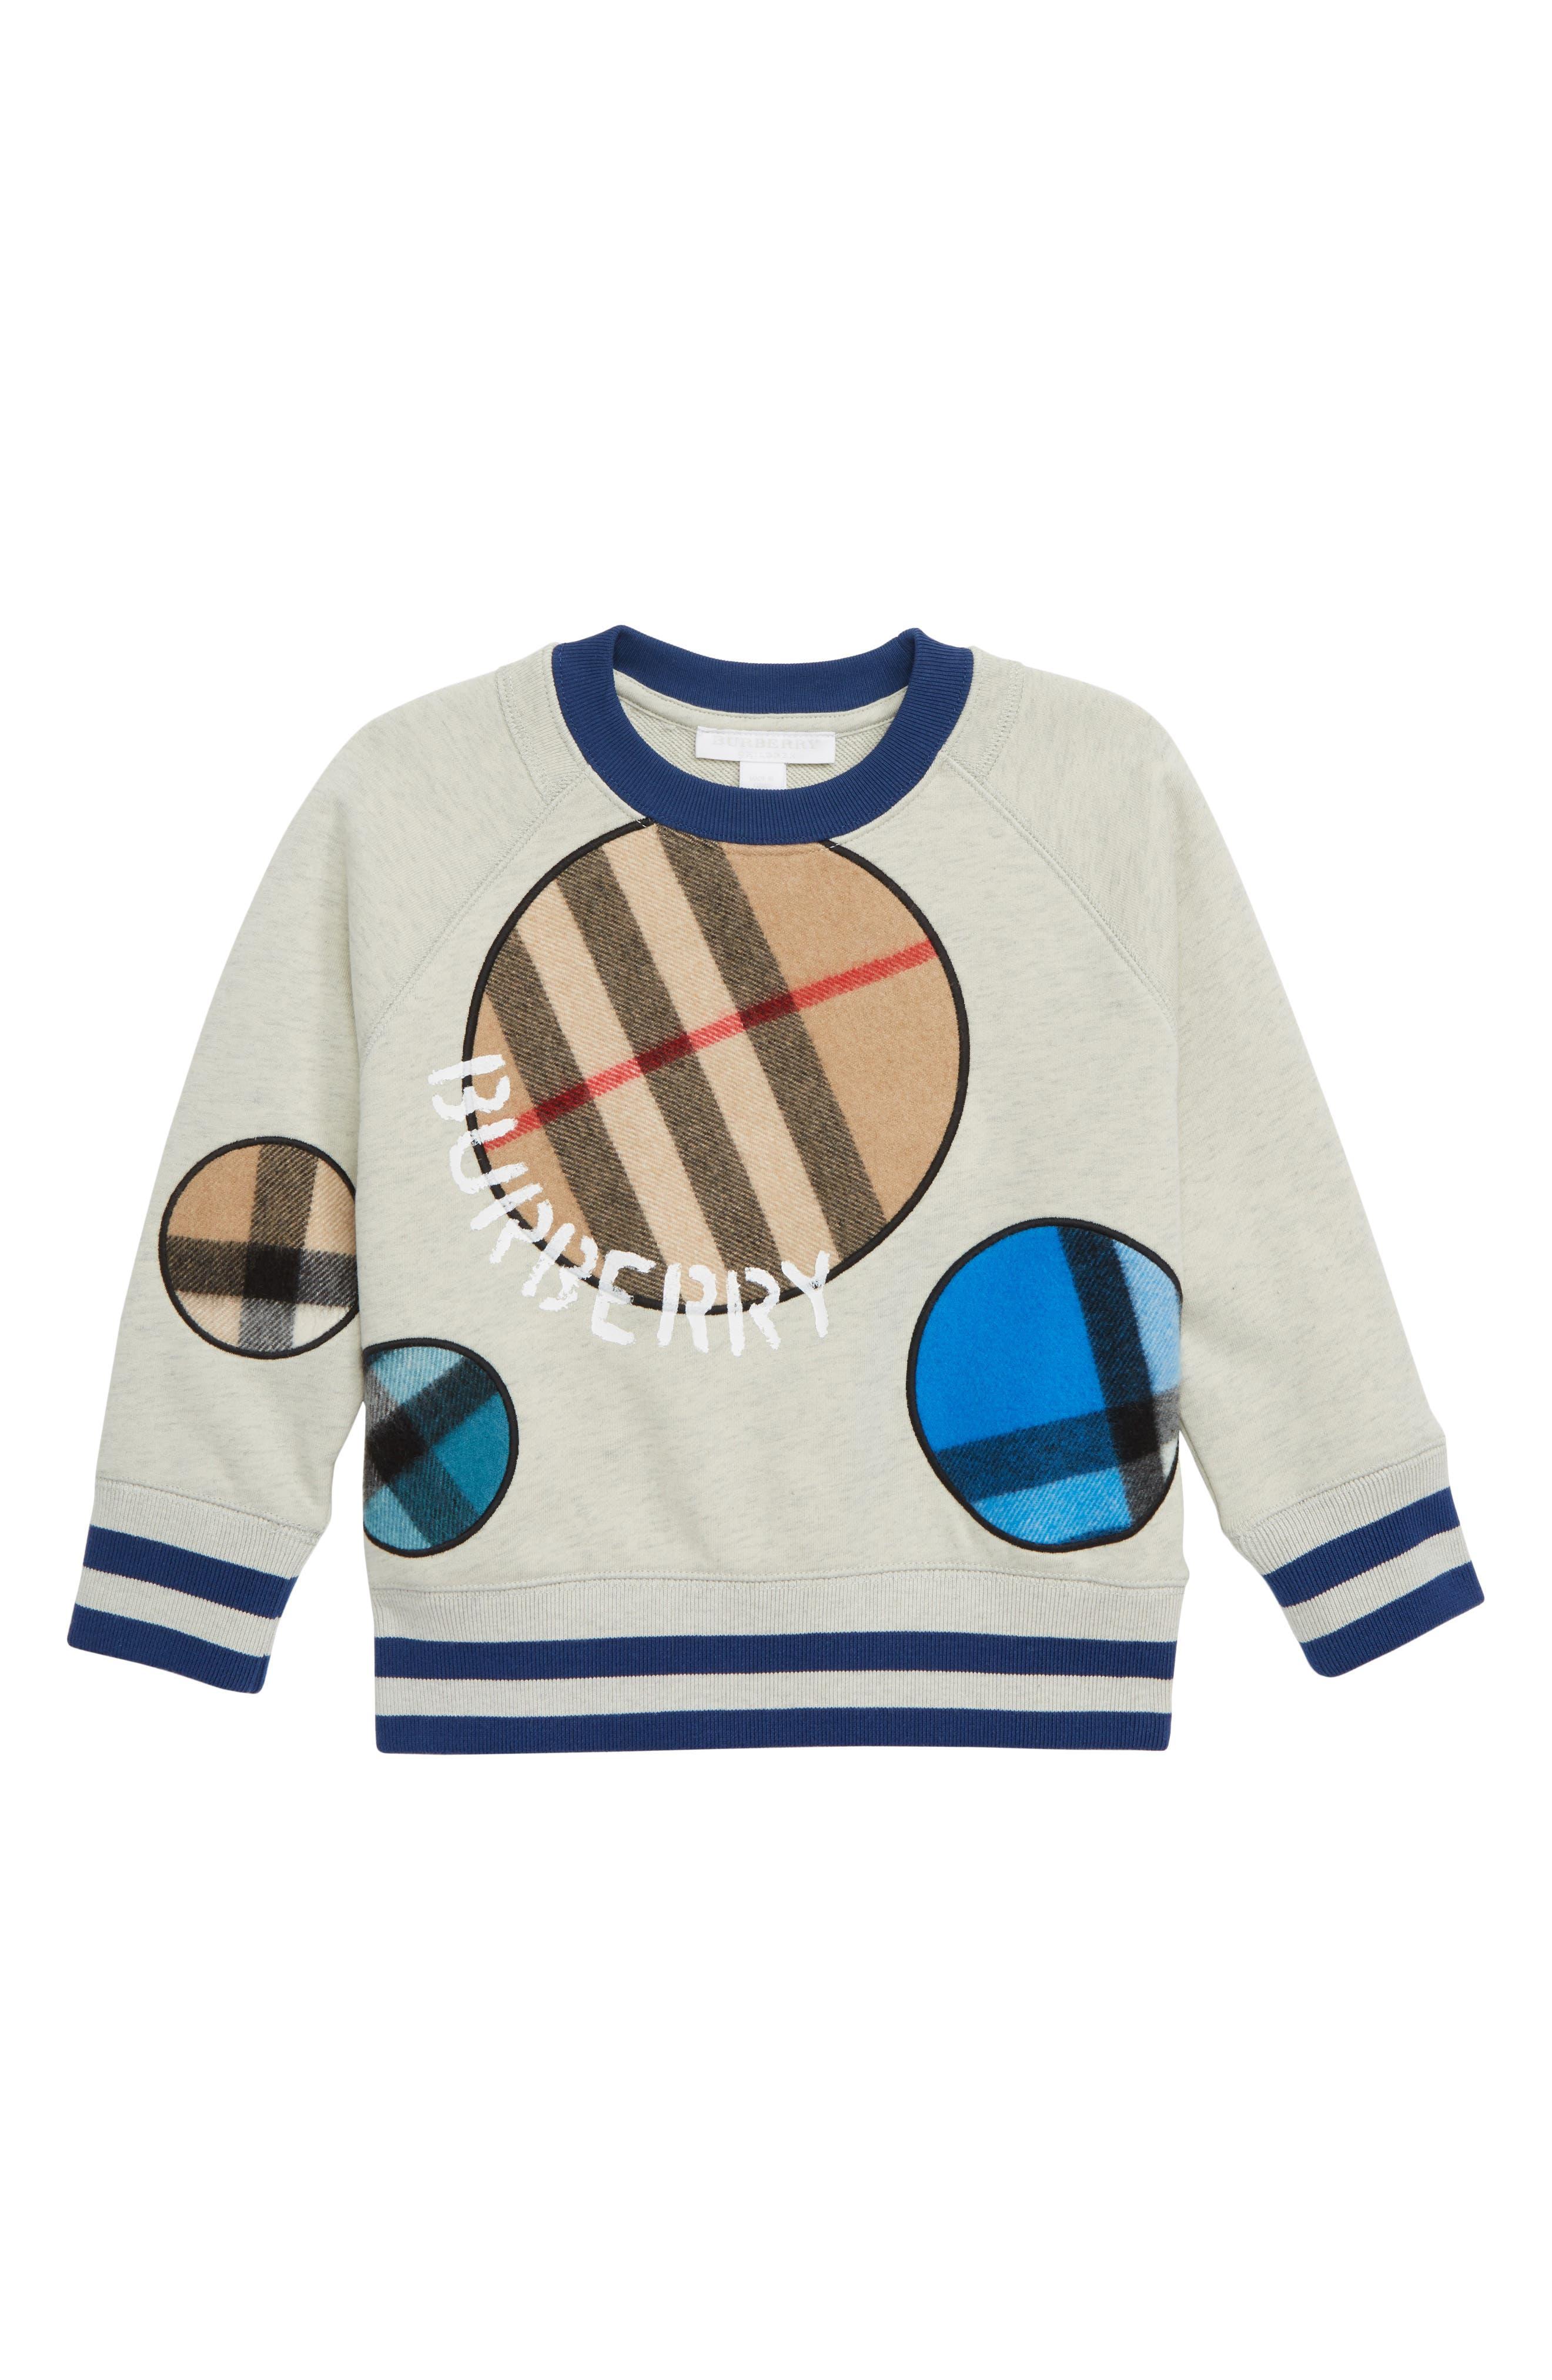 Check Dots Sweatshirt, Main, color, MULTICOLOUR